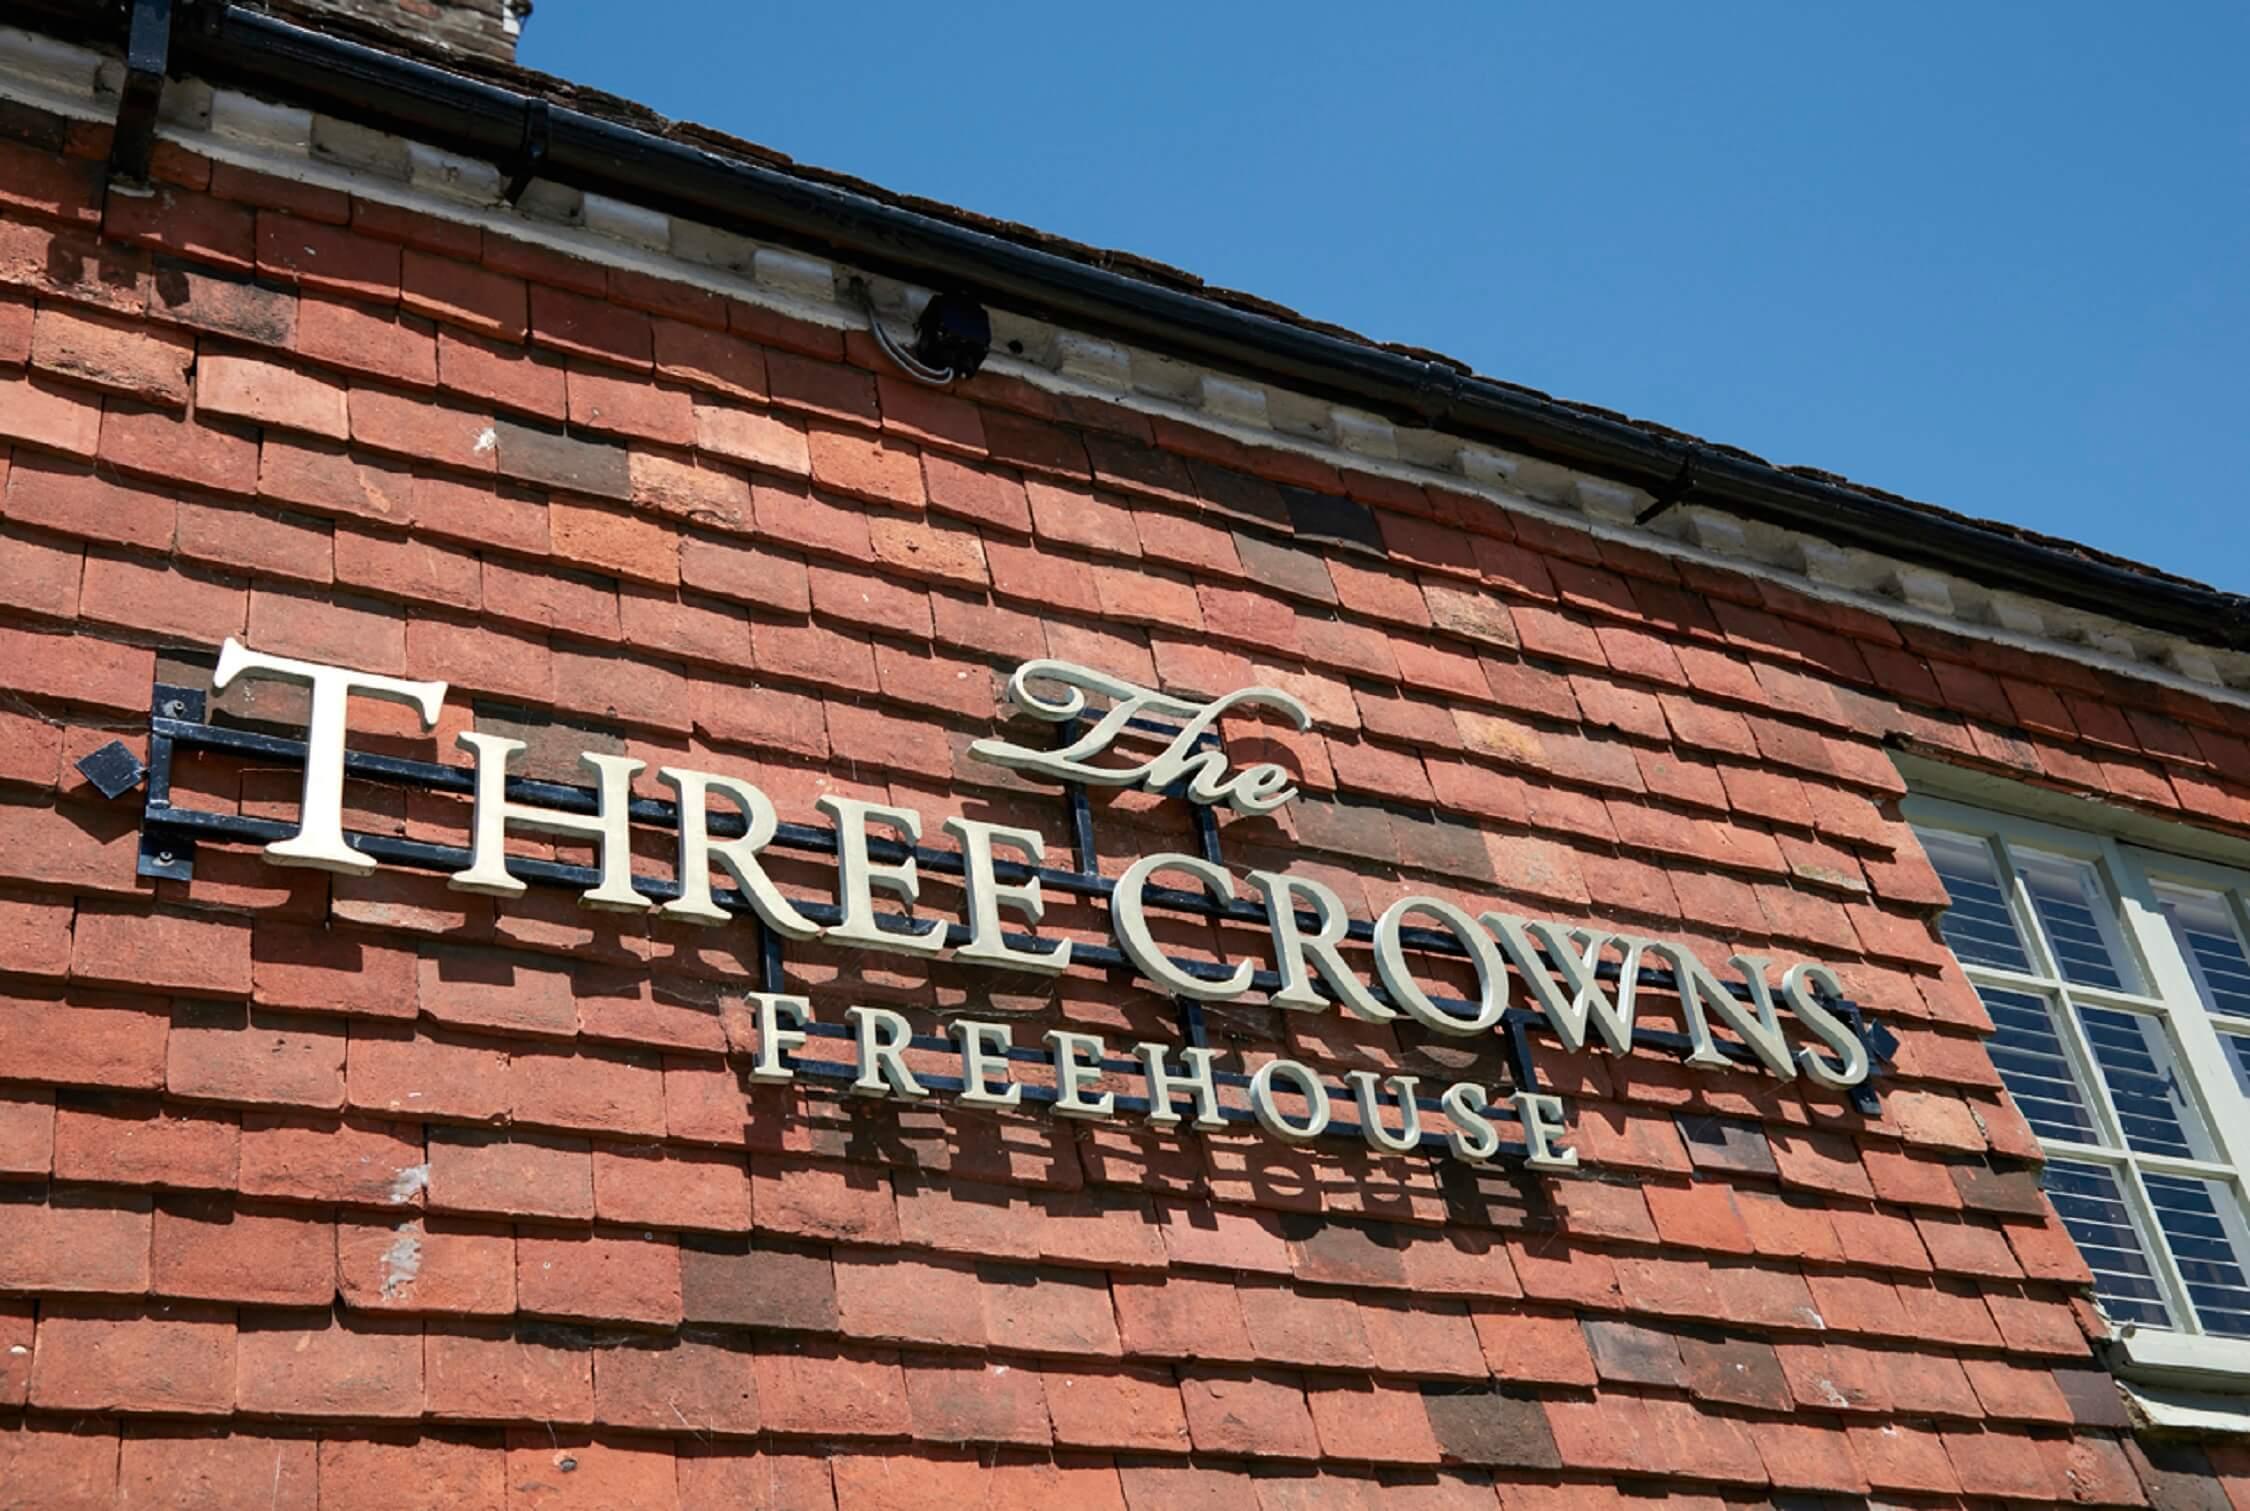 Three Crowns - fantastic local pub